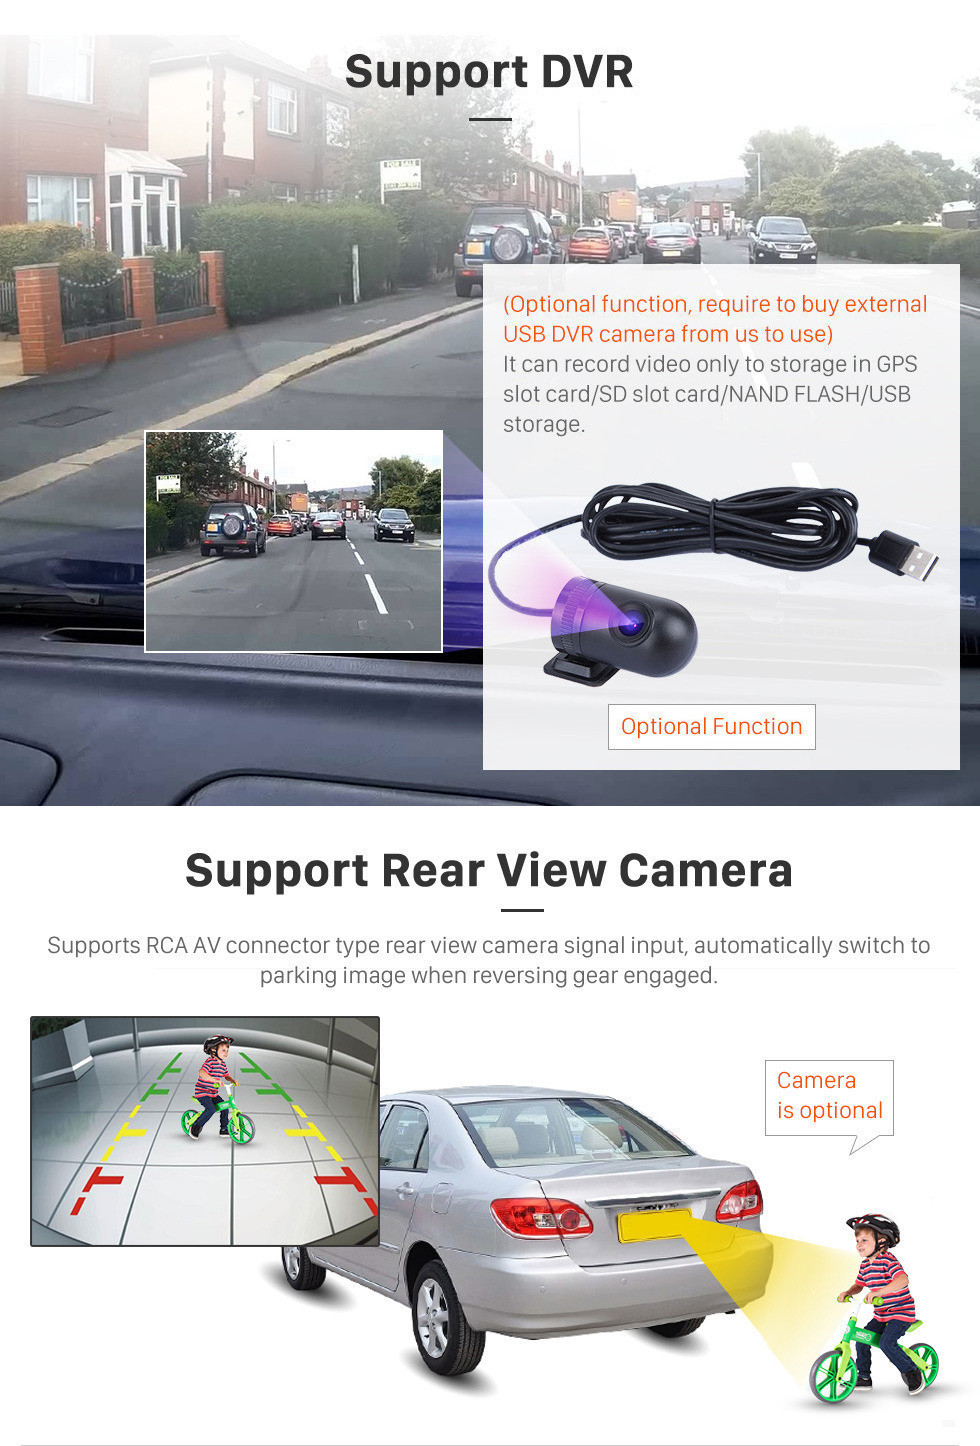 Seicane OEM 8 Inch Android 10.0 HD Touchscreen Car Radio Head Unit For 2008 2009 2010 2011 GMC Savana Full Size Van GPS Navigation Bluetooth WIFI Support Mirror Link USB DVR 1080P Video Steering Wheel Control